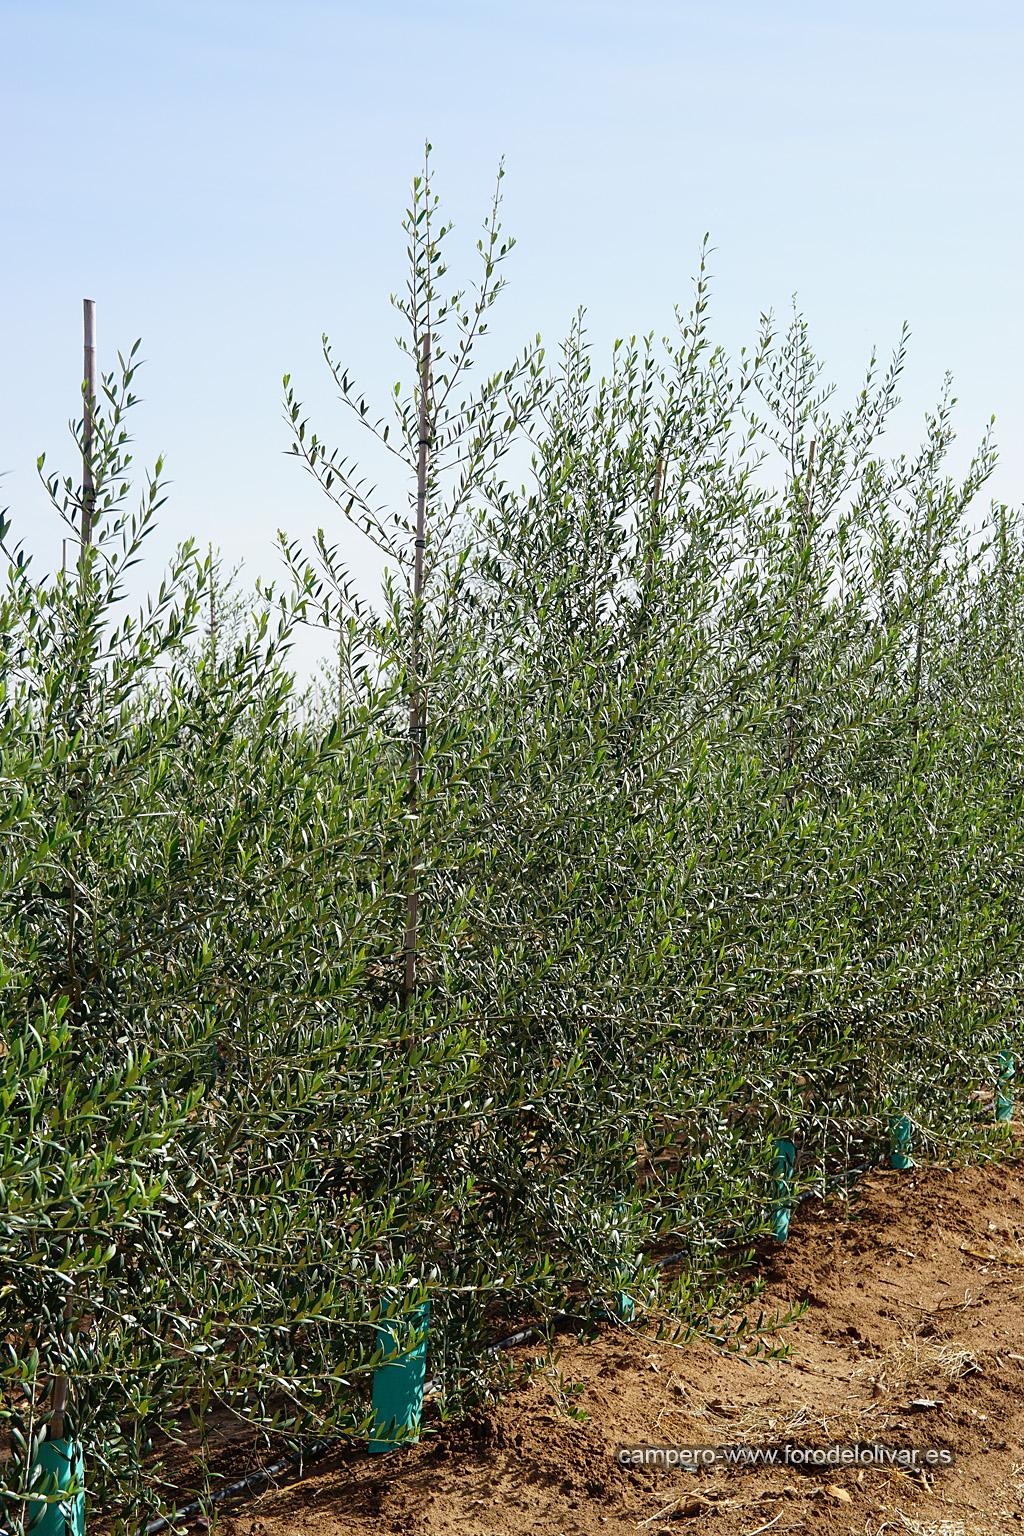 Plantación de olivar superintensivo en emparrado (Badajoz) 33k9eab